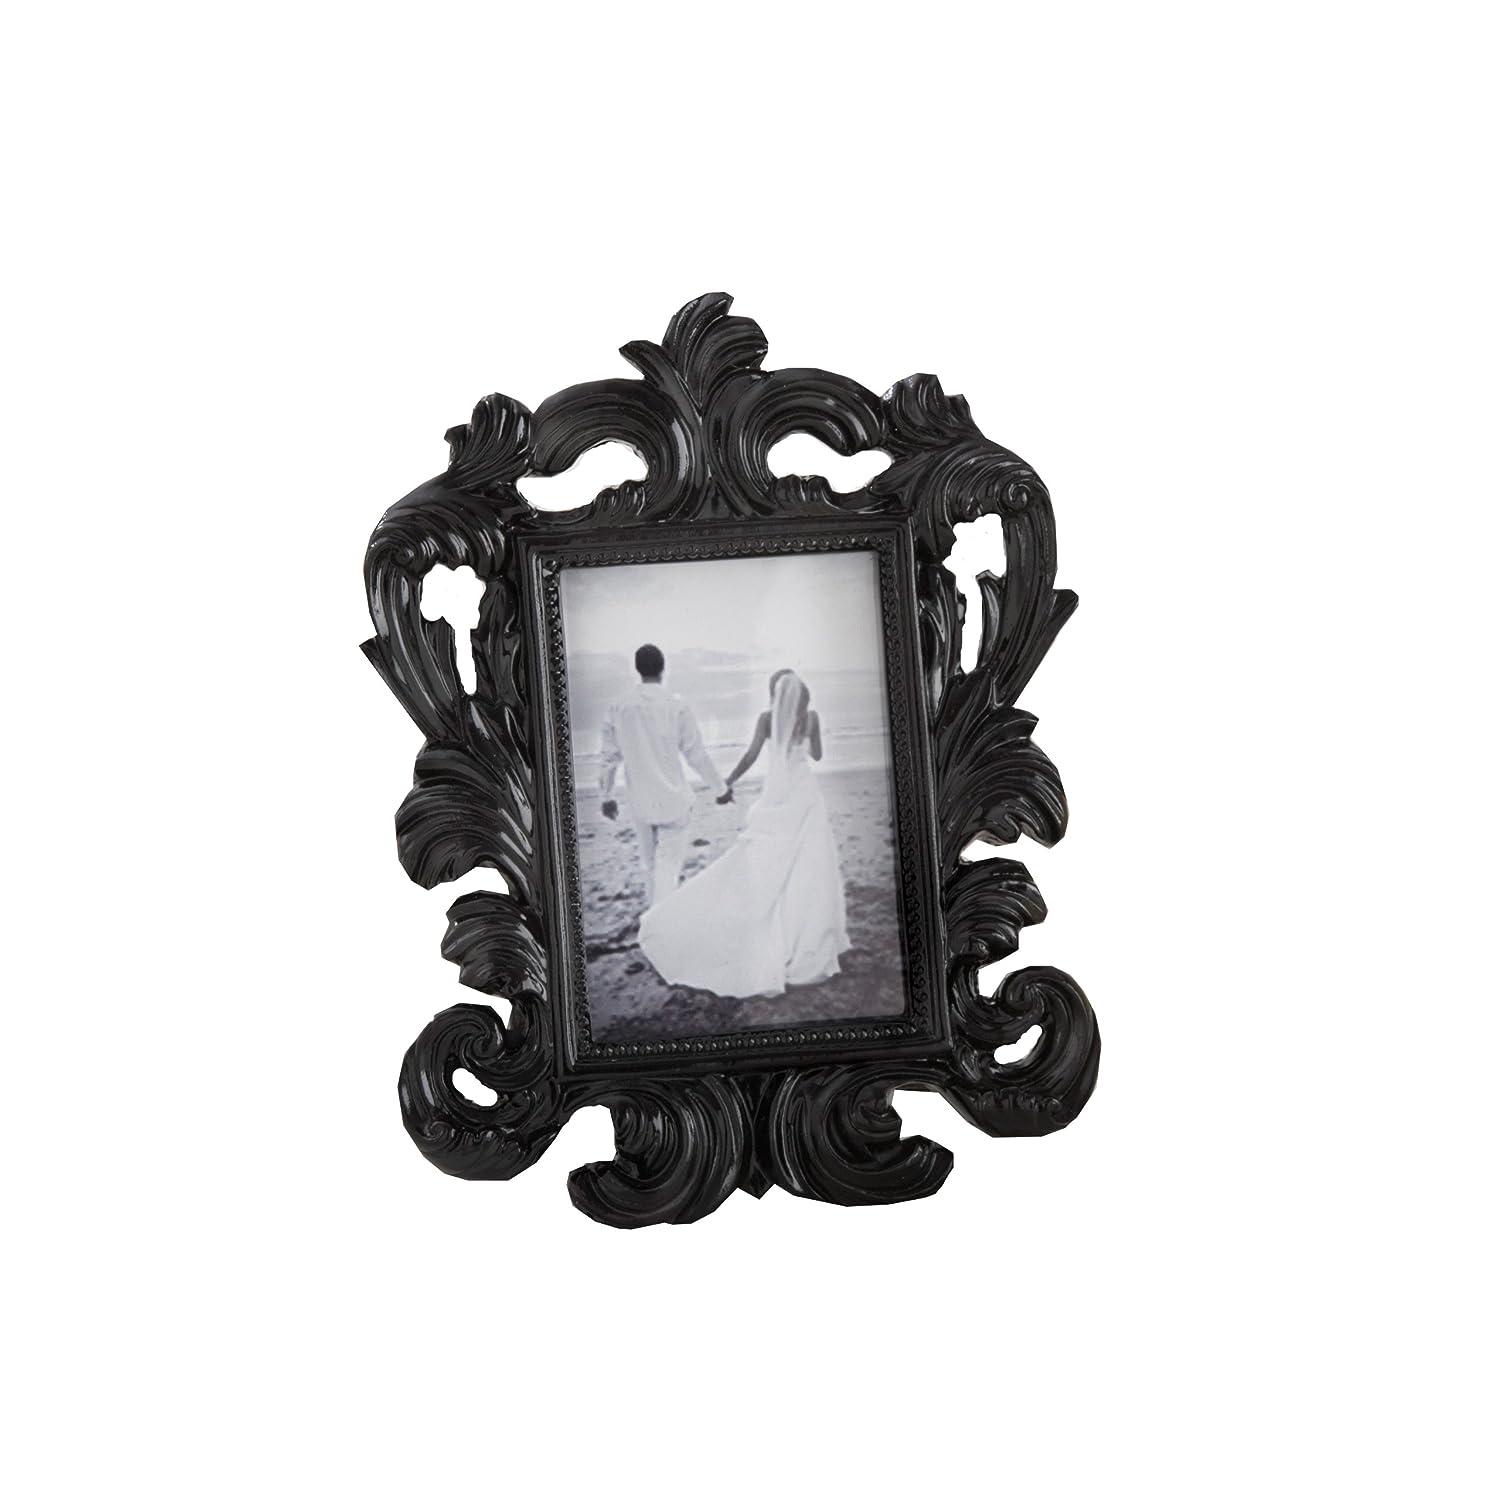 Kate Aspen 25067BK Baroque Place Card Holder and Frame